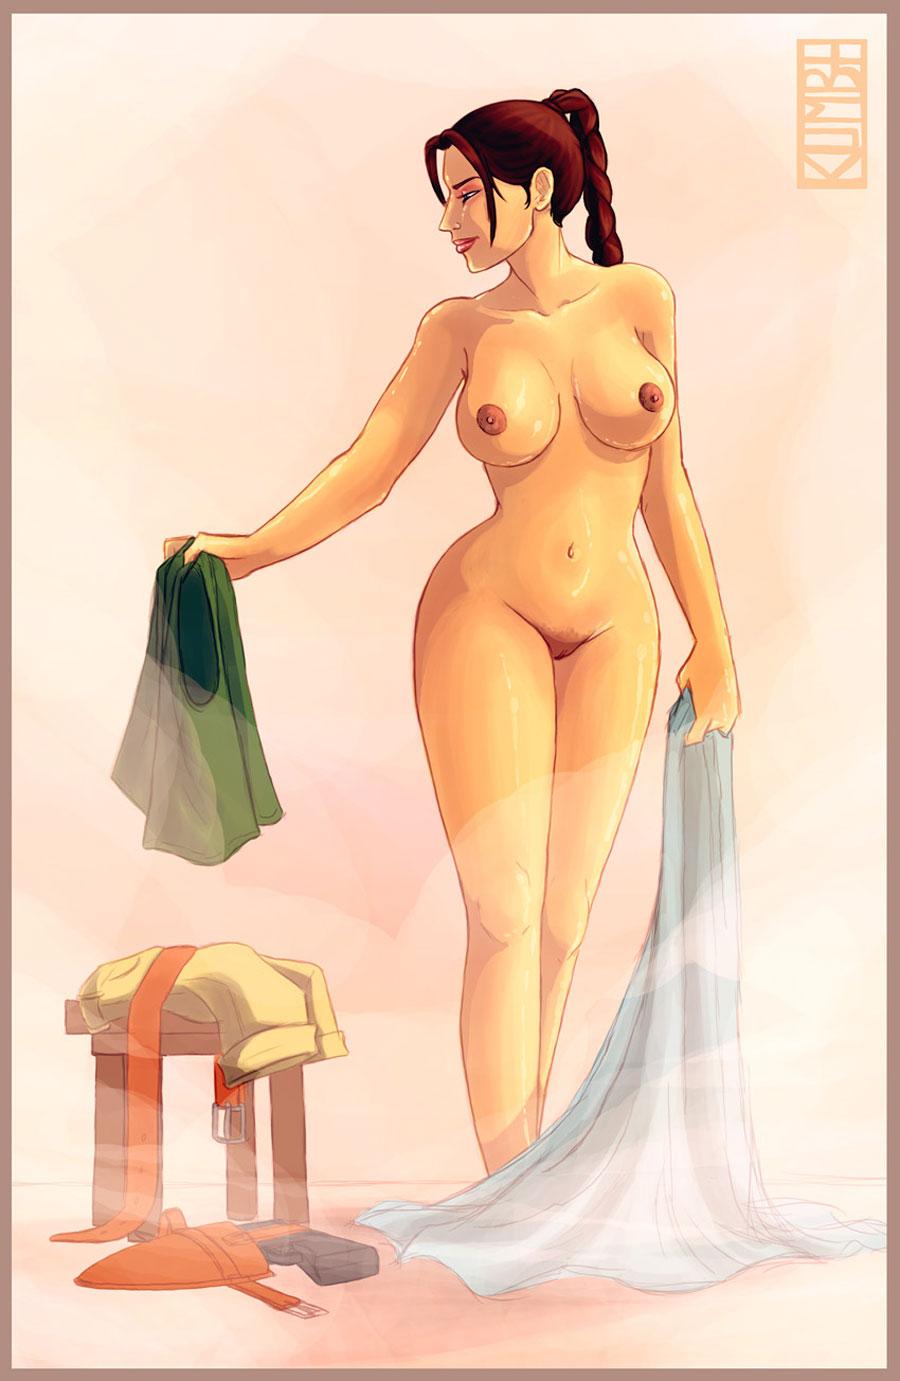 croft porn Lara cartoon